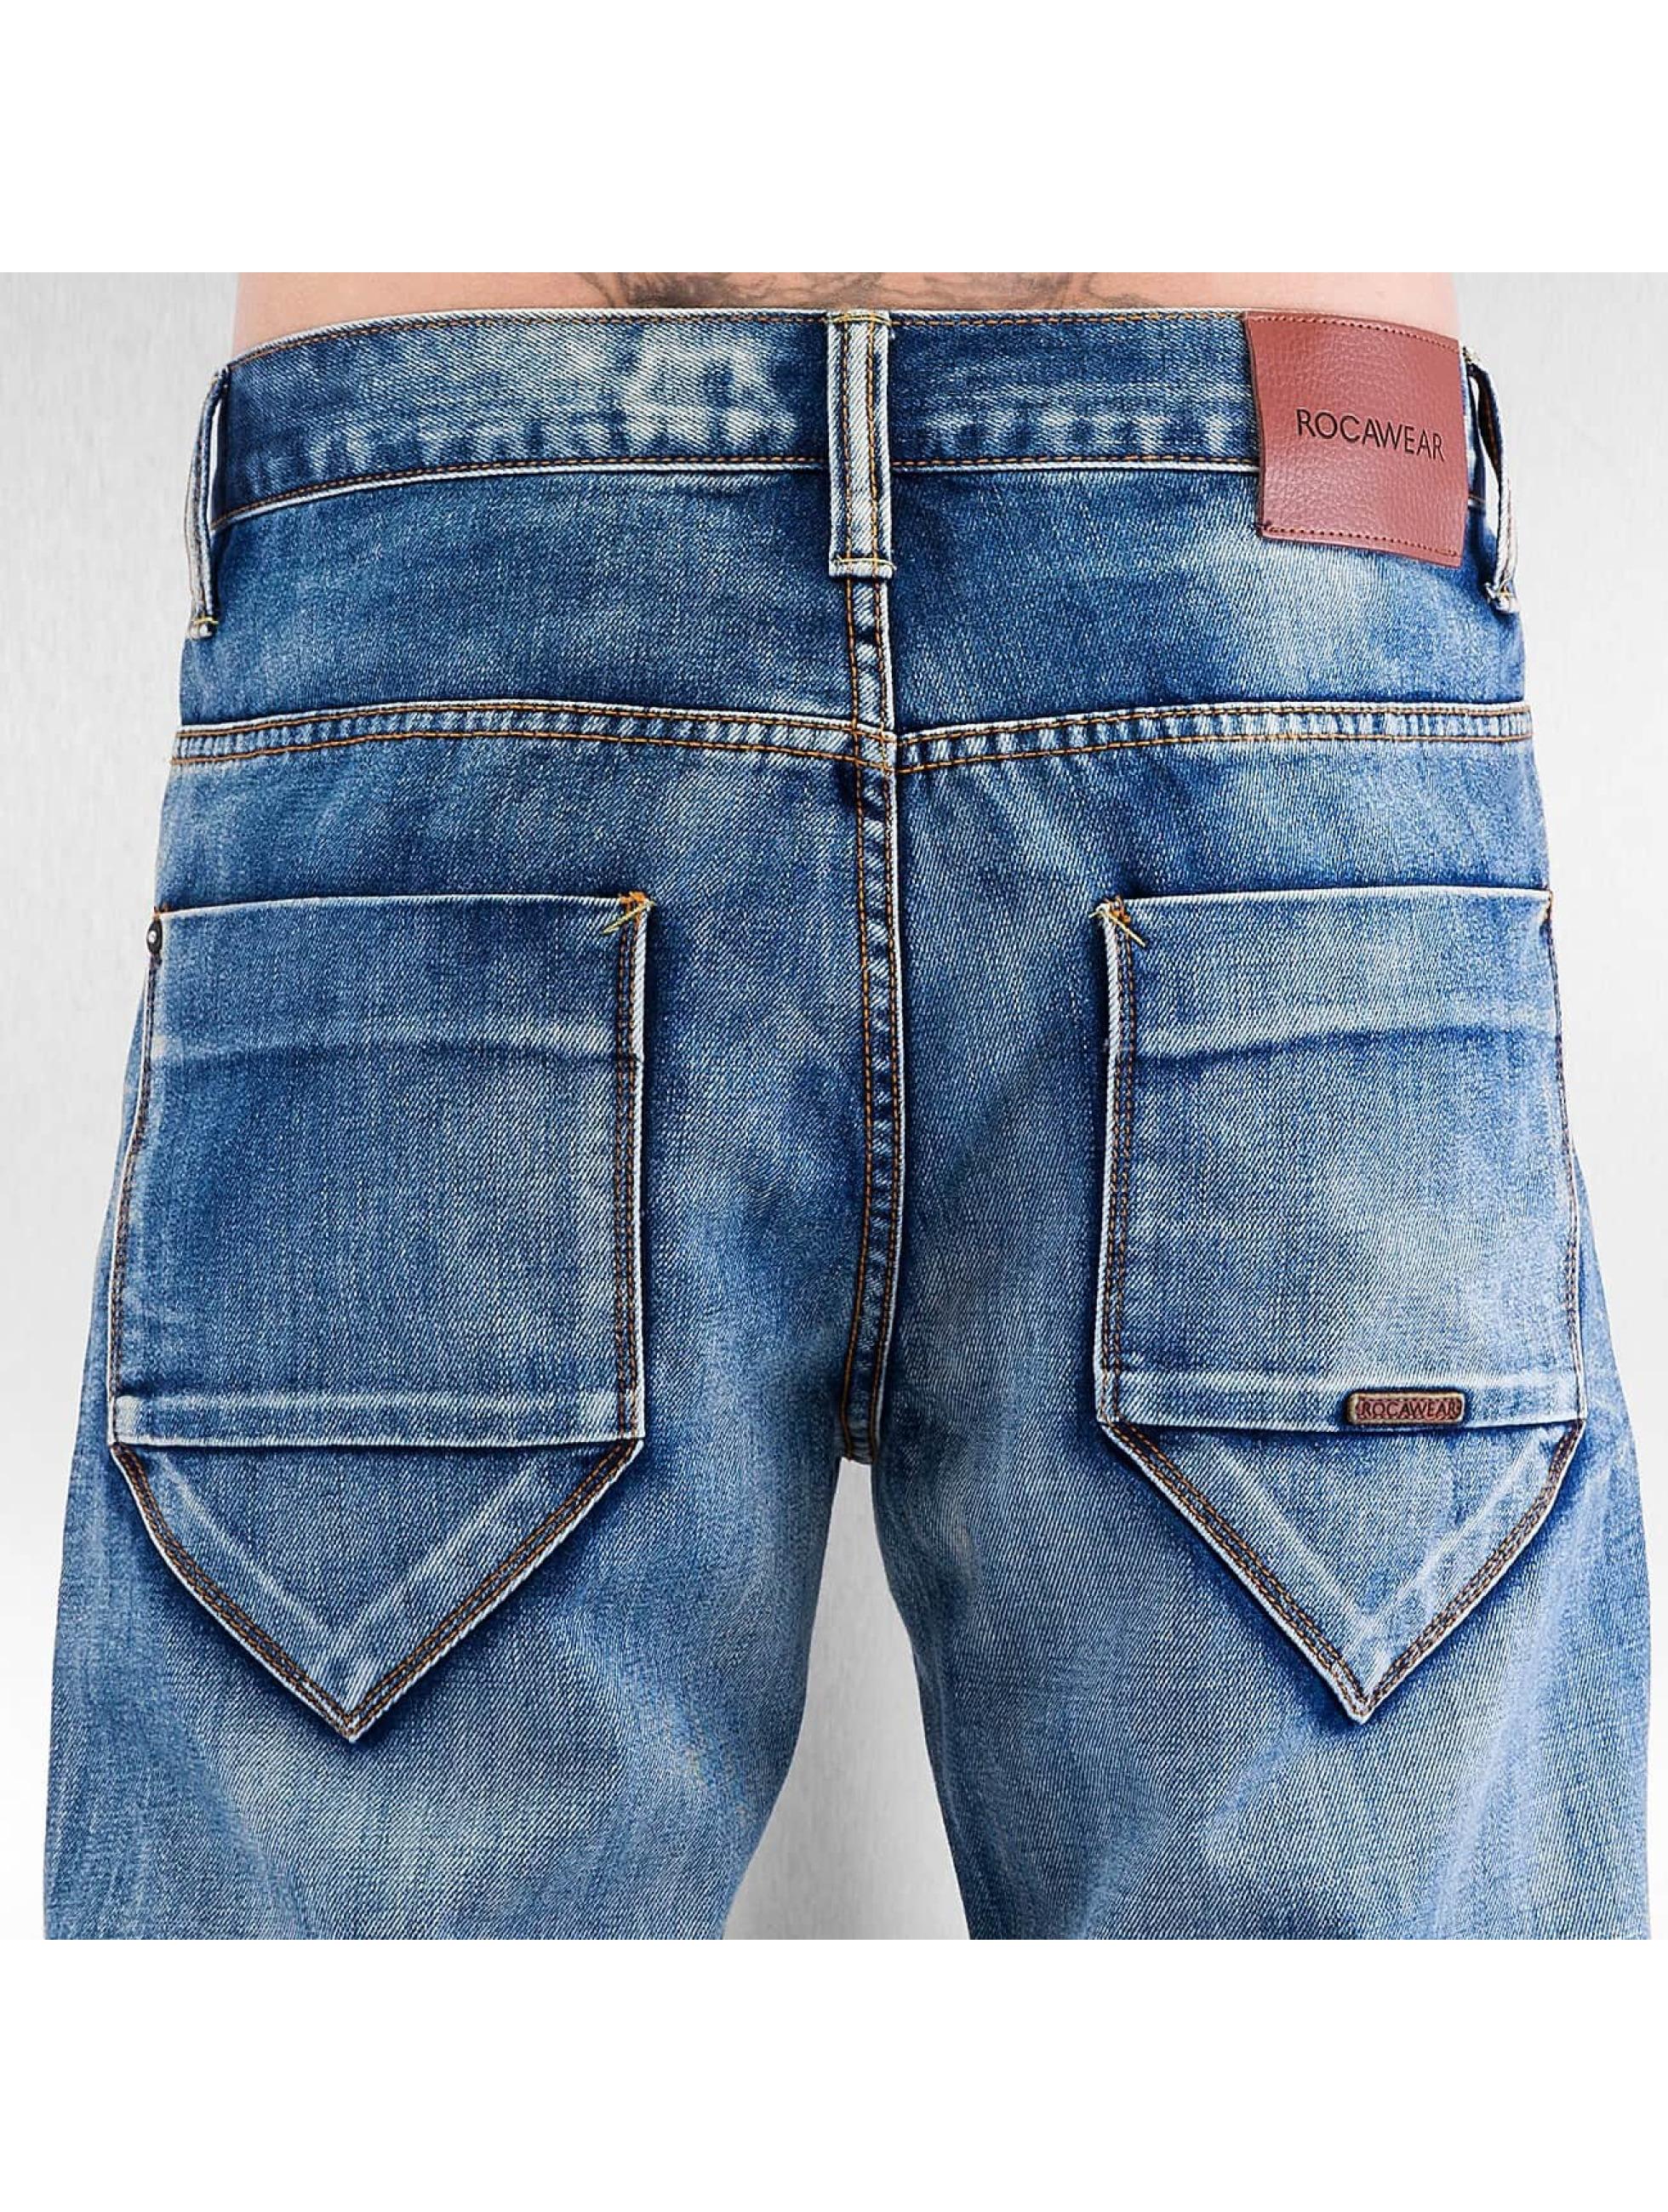 Rocawear Loose Fit Jeans Tapered Loose Fit niebieski